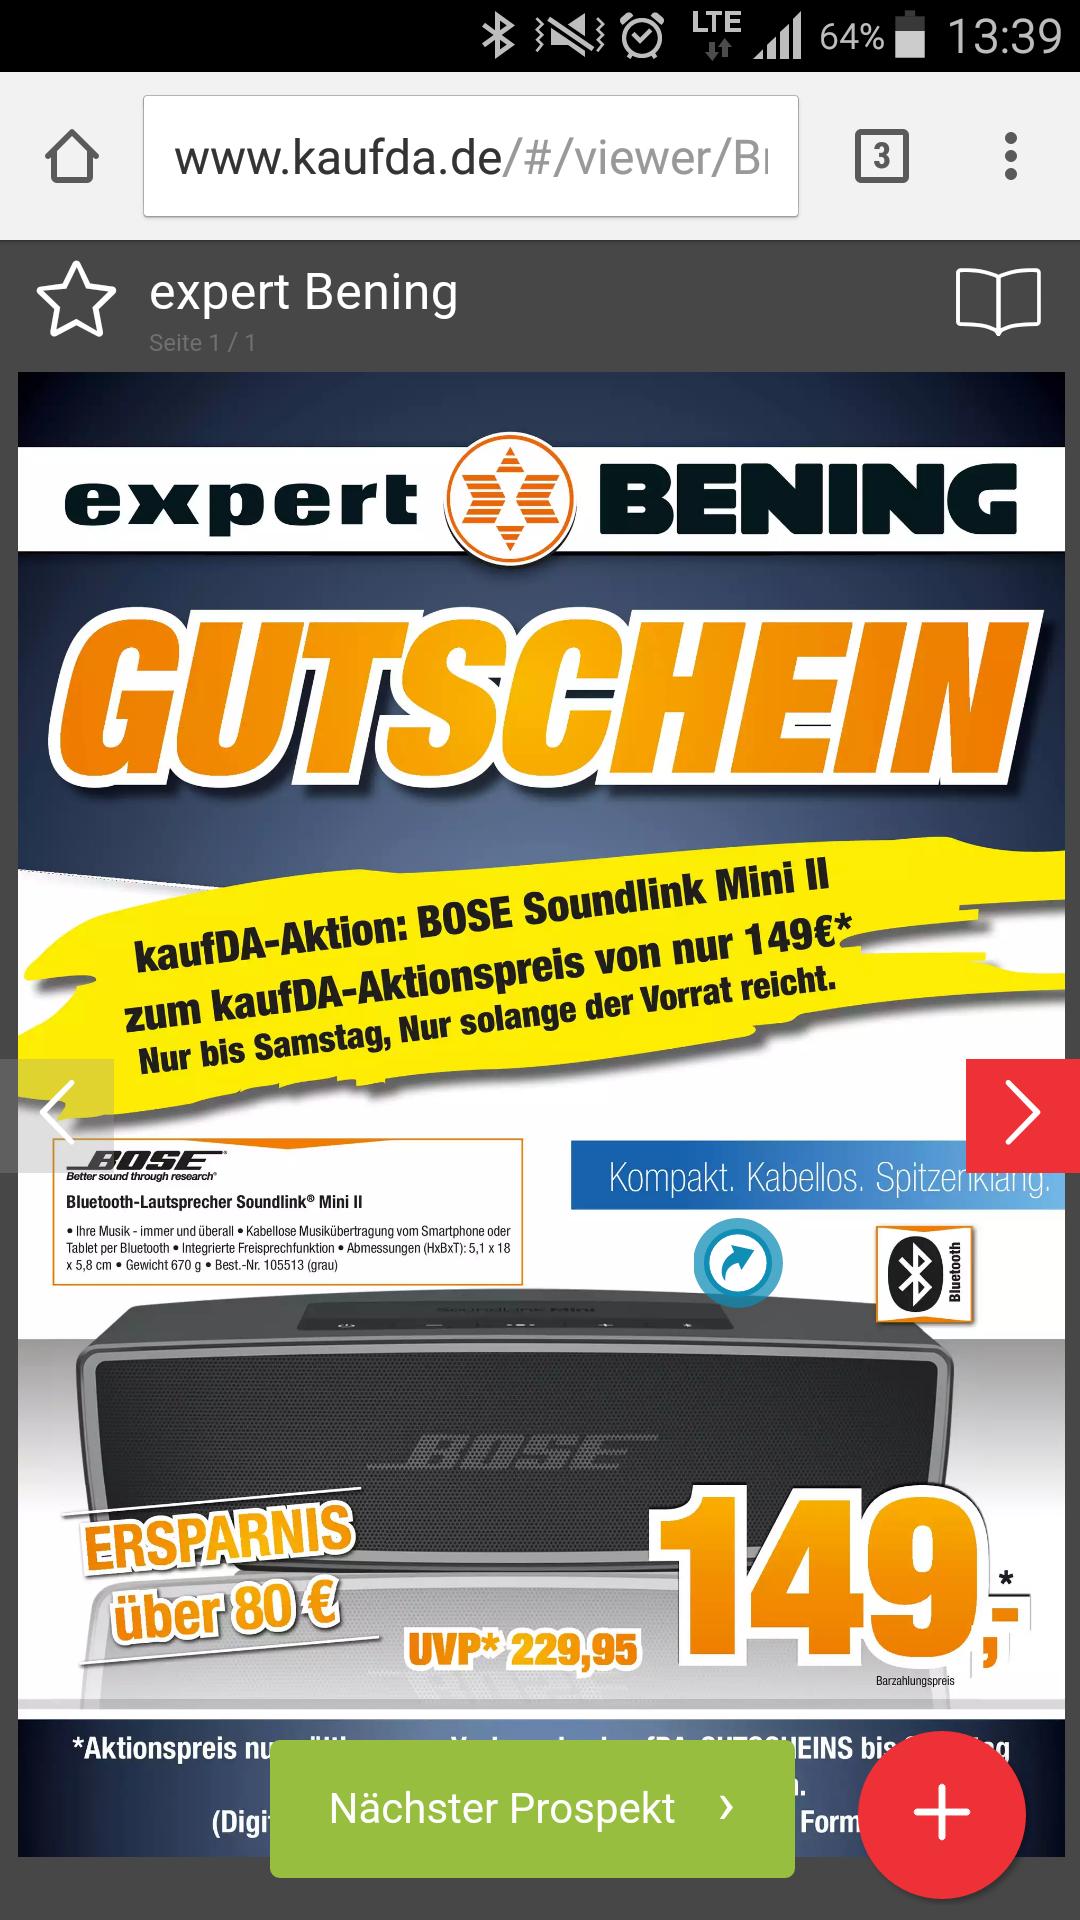 [Offline alle 19 Expert Bening Filialen]Bose SoundLink Mini II - Multimedia-Lautsprecher 149,-€